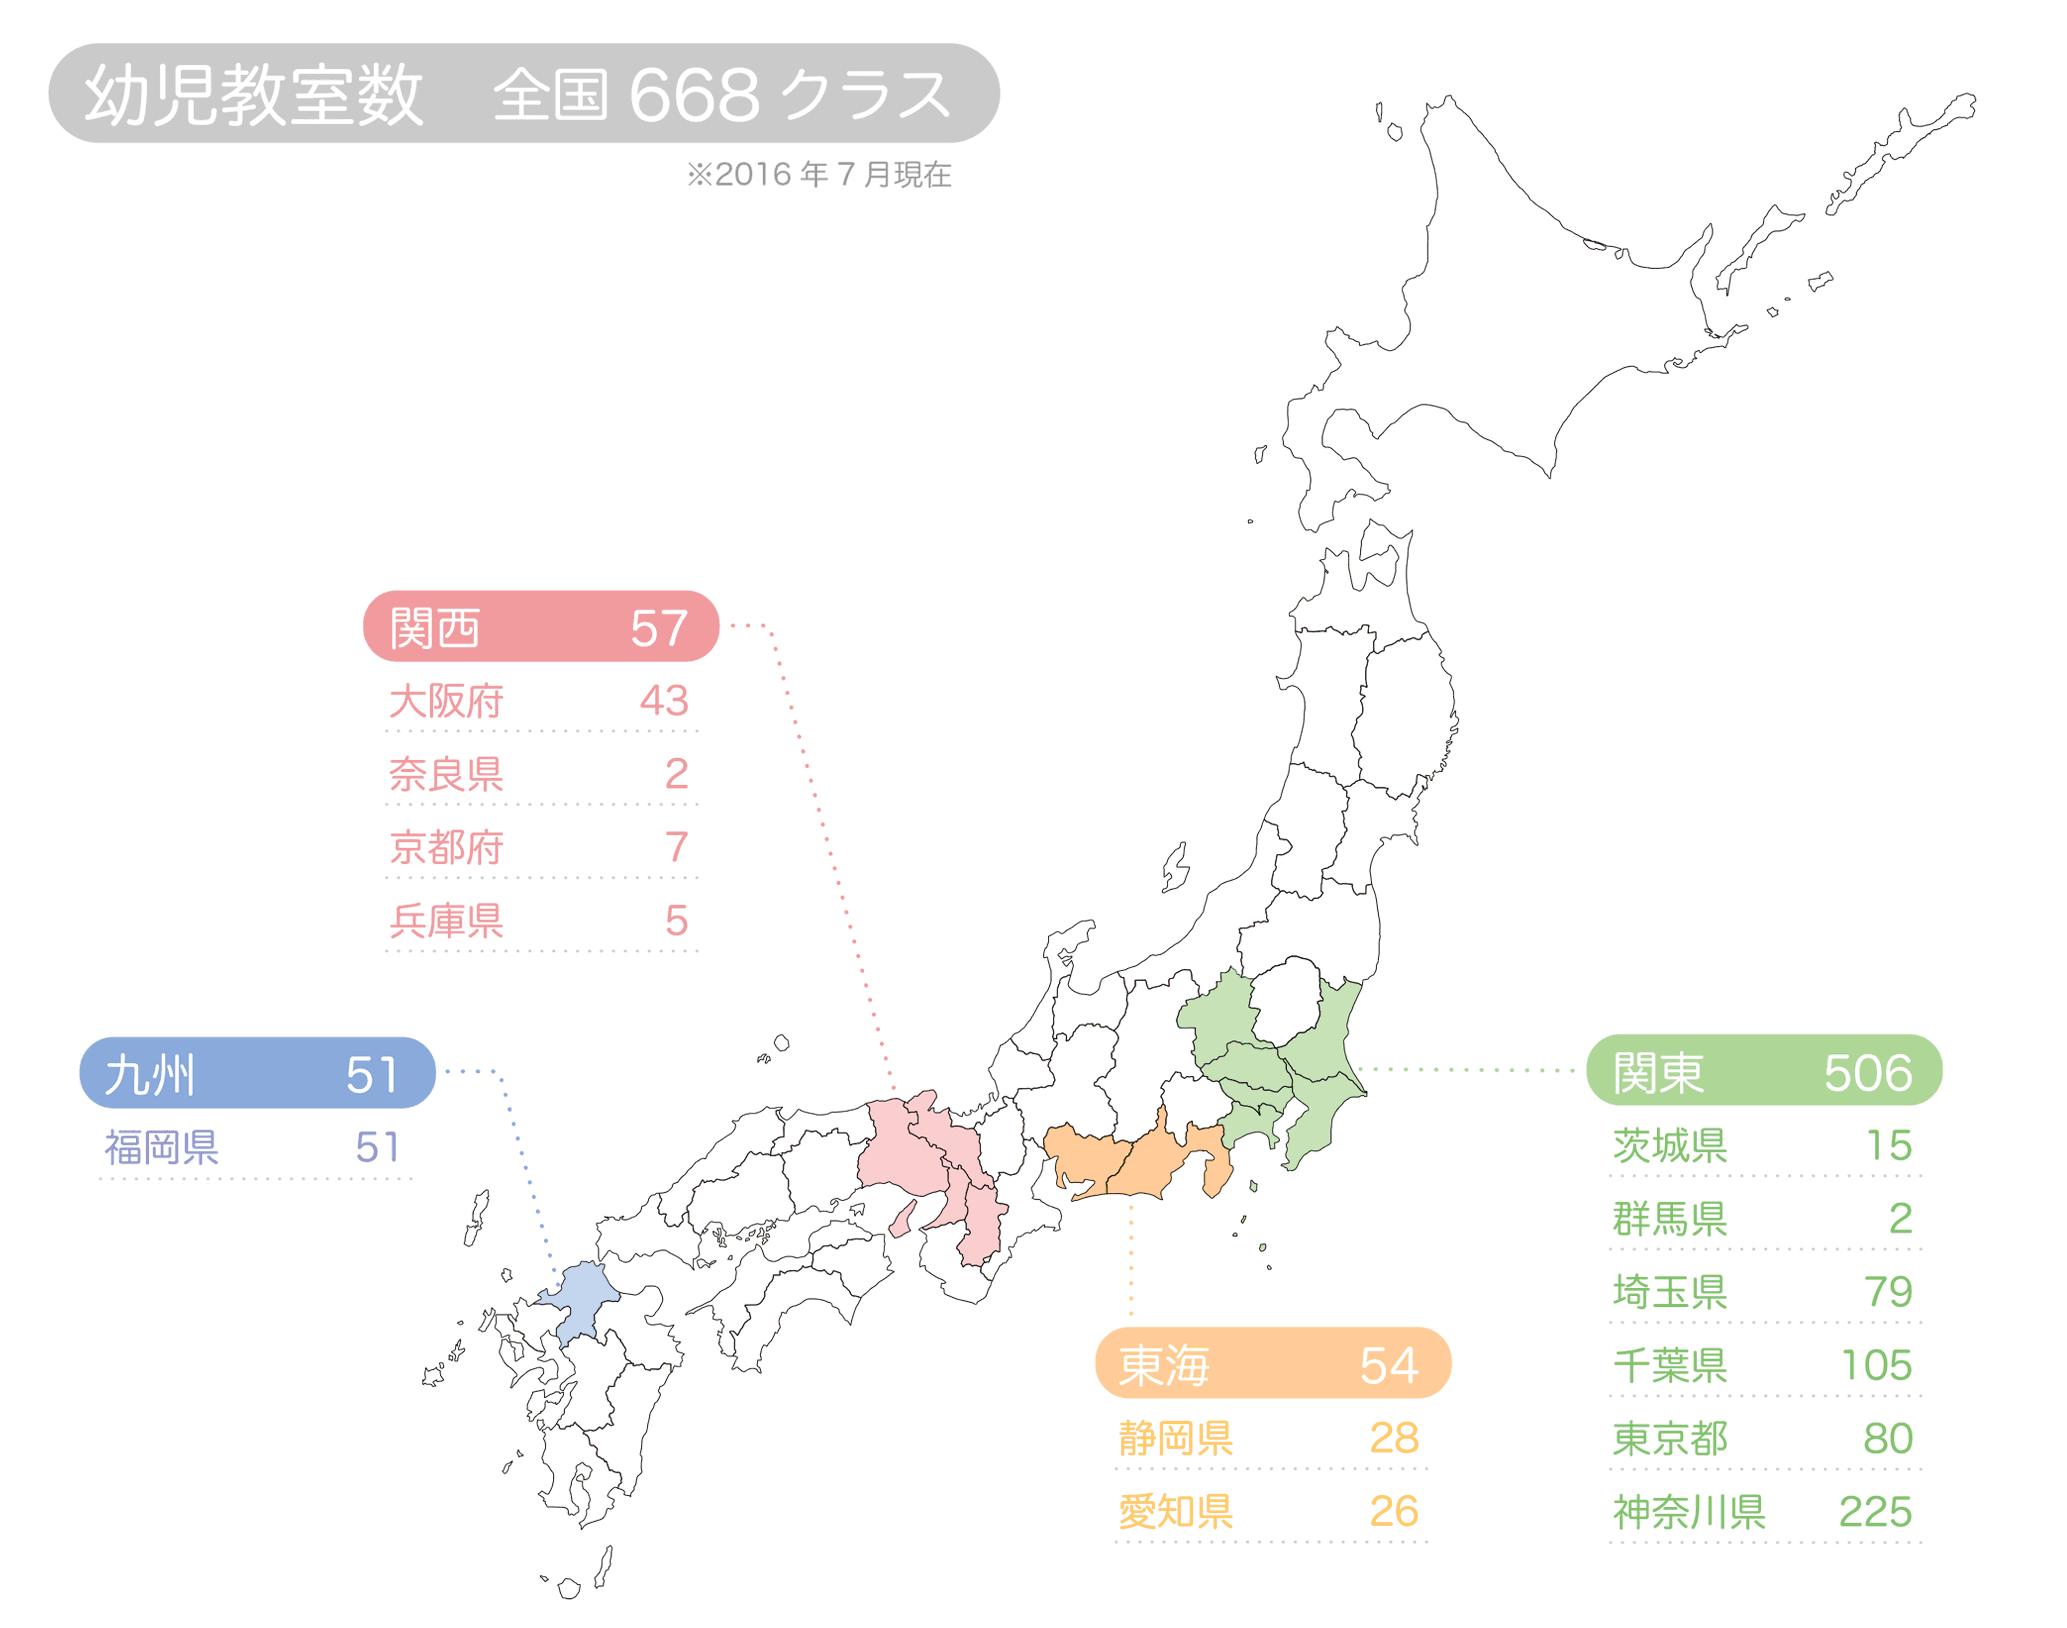 kaisya-gaiyou-map